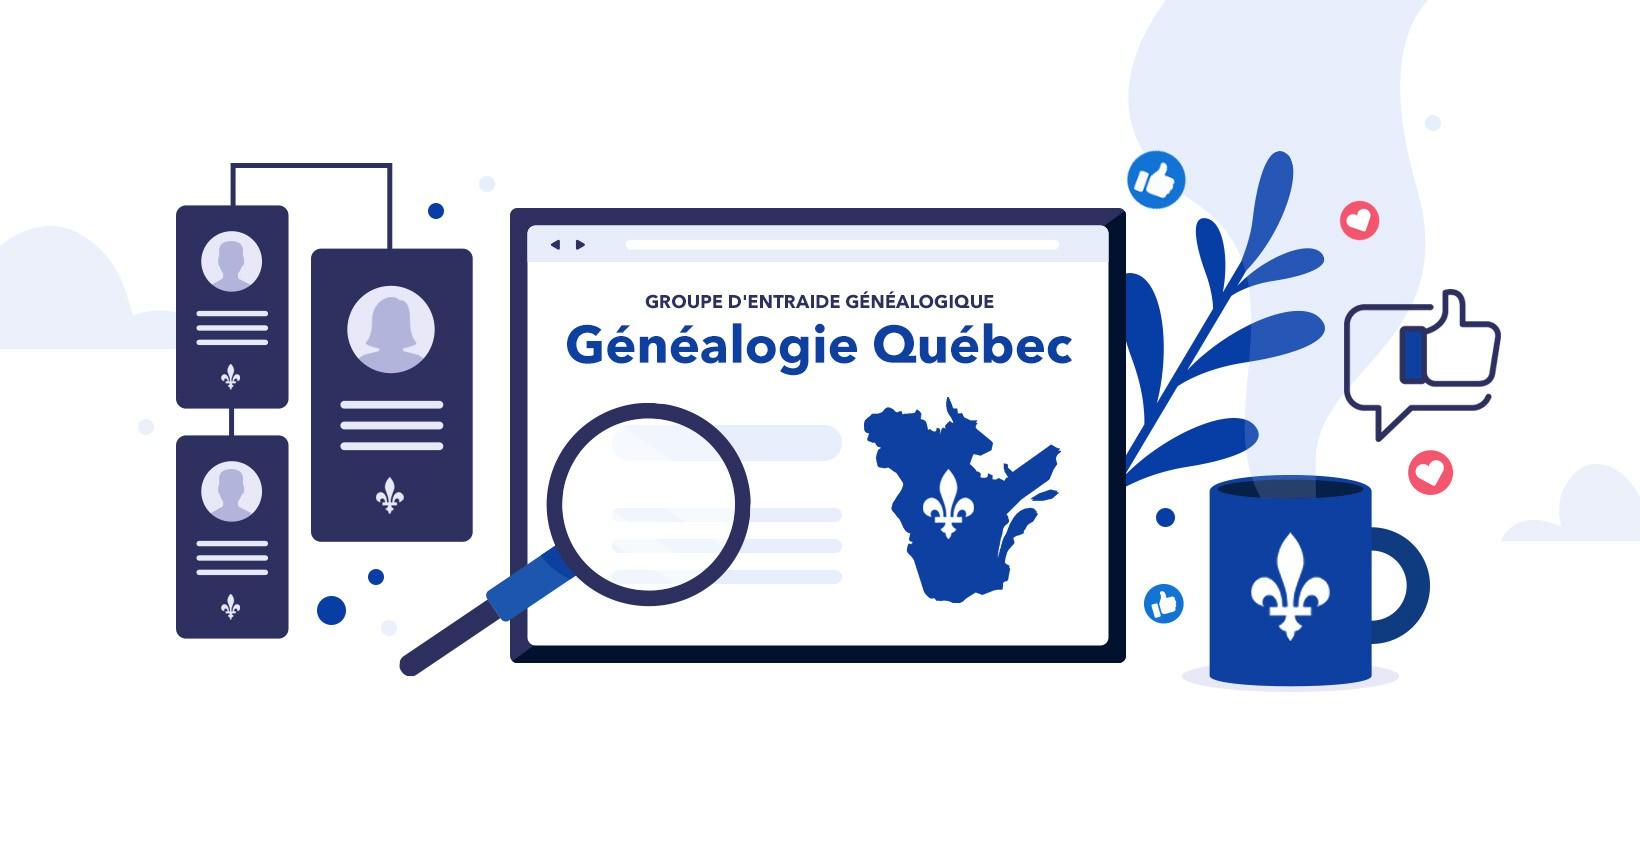 Généalogie Québec, Facebook landing image